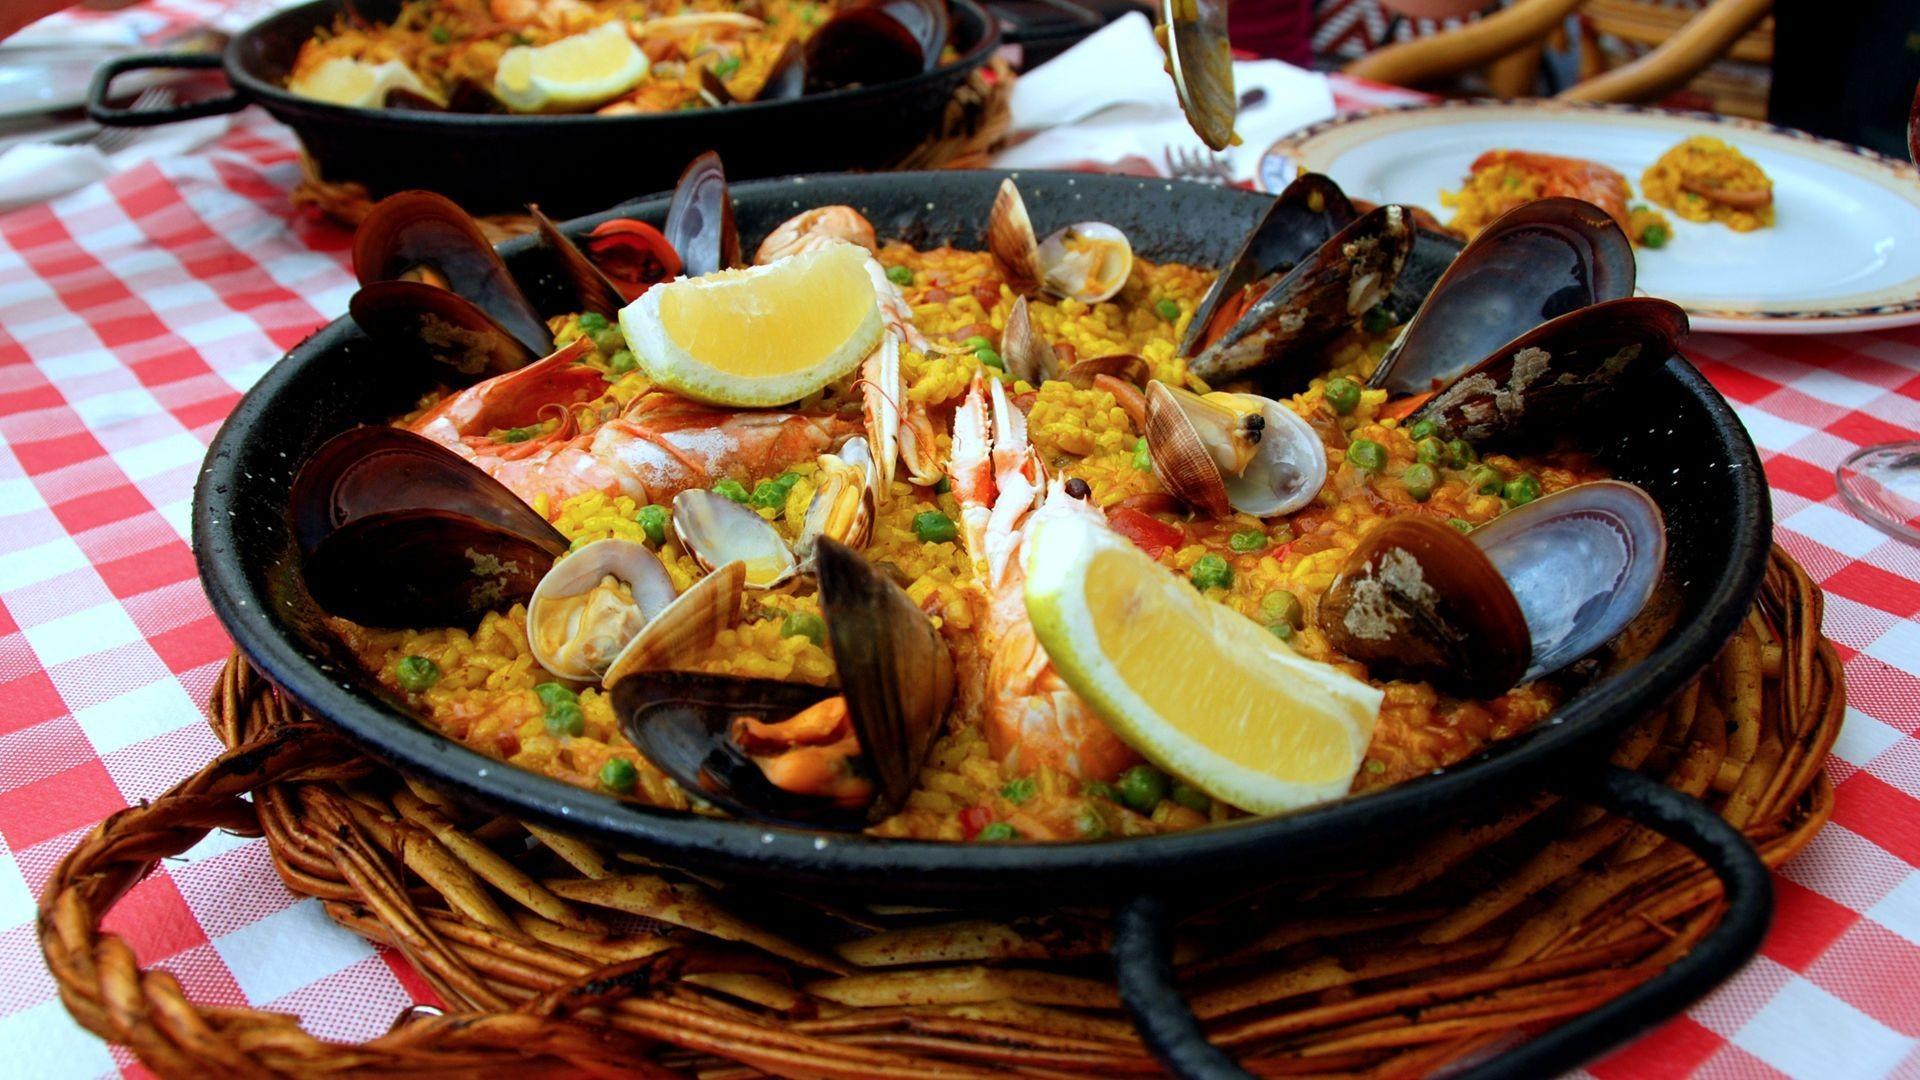 Comida casera en Aranda de Duero